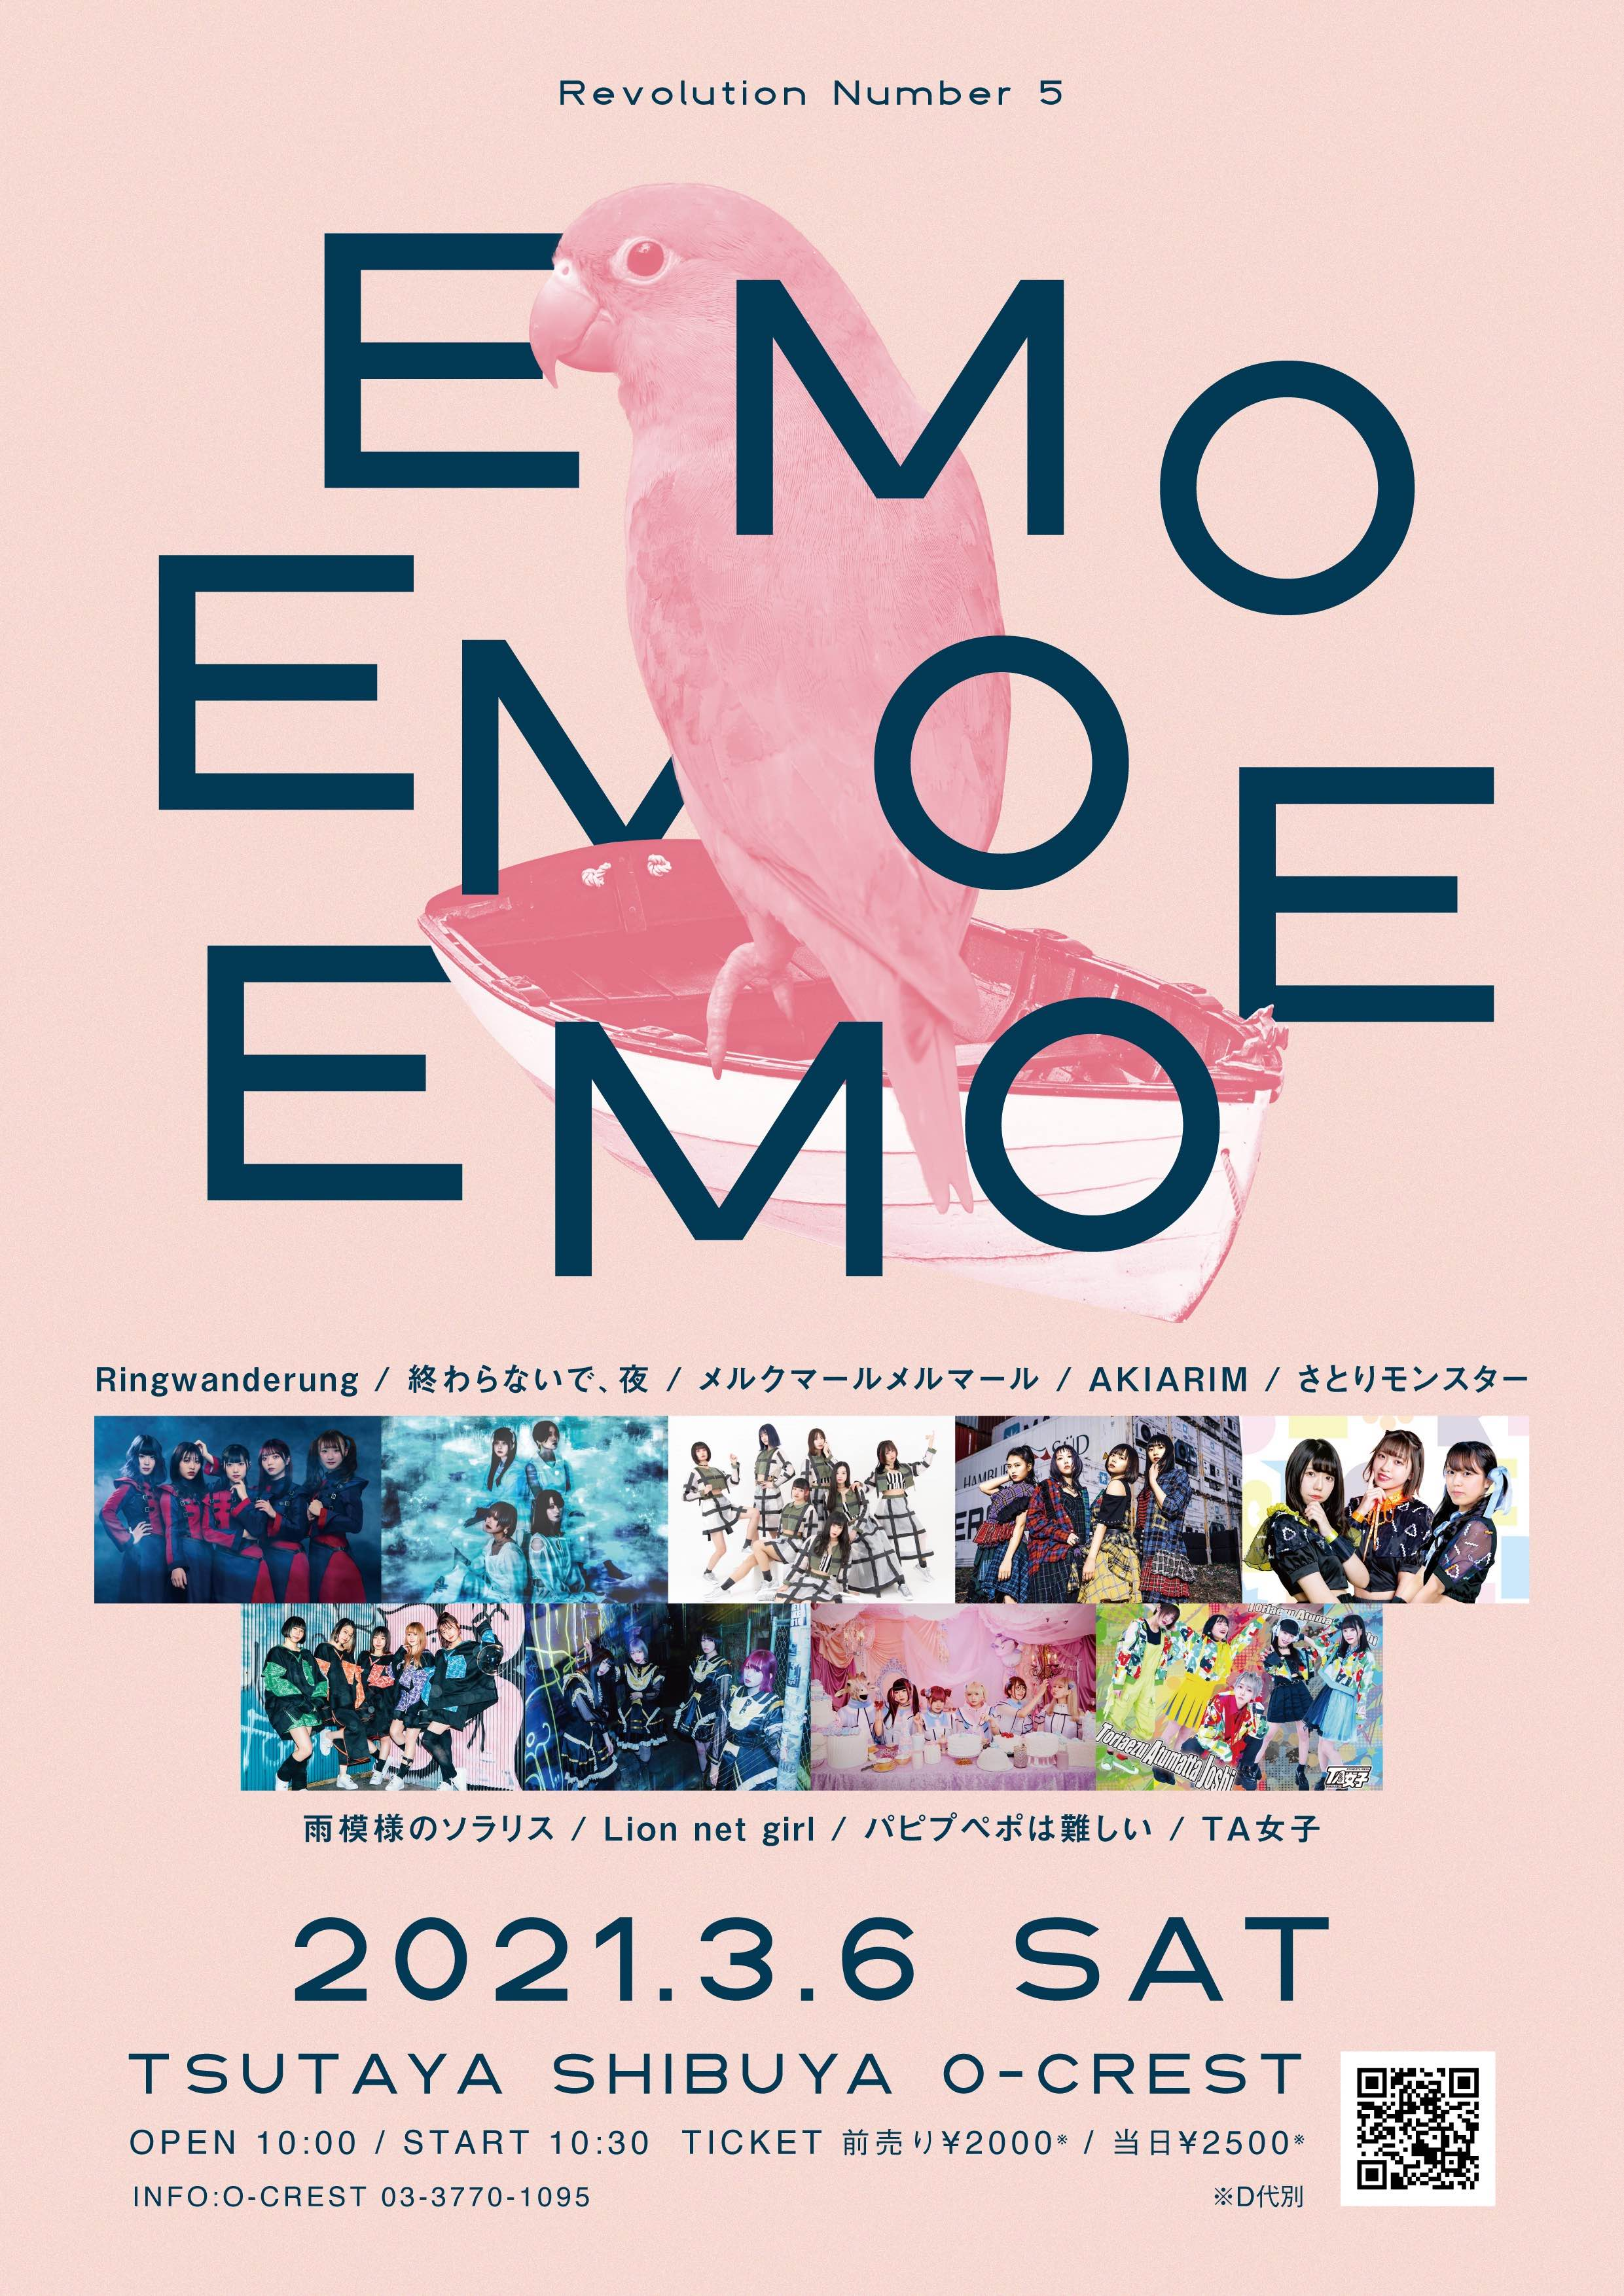 『emoemoemoe』   〜Revolution Number 5〜